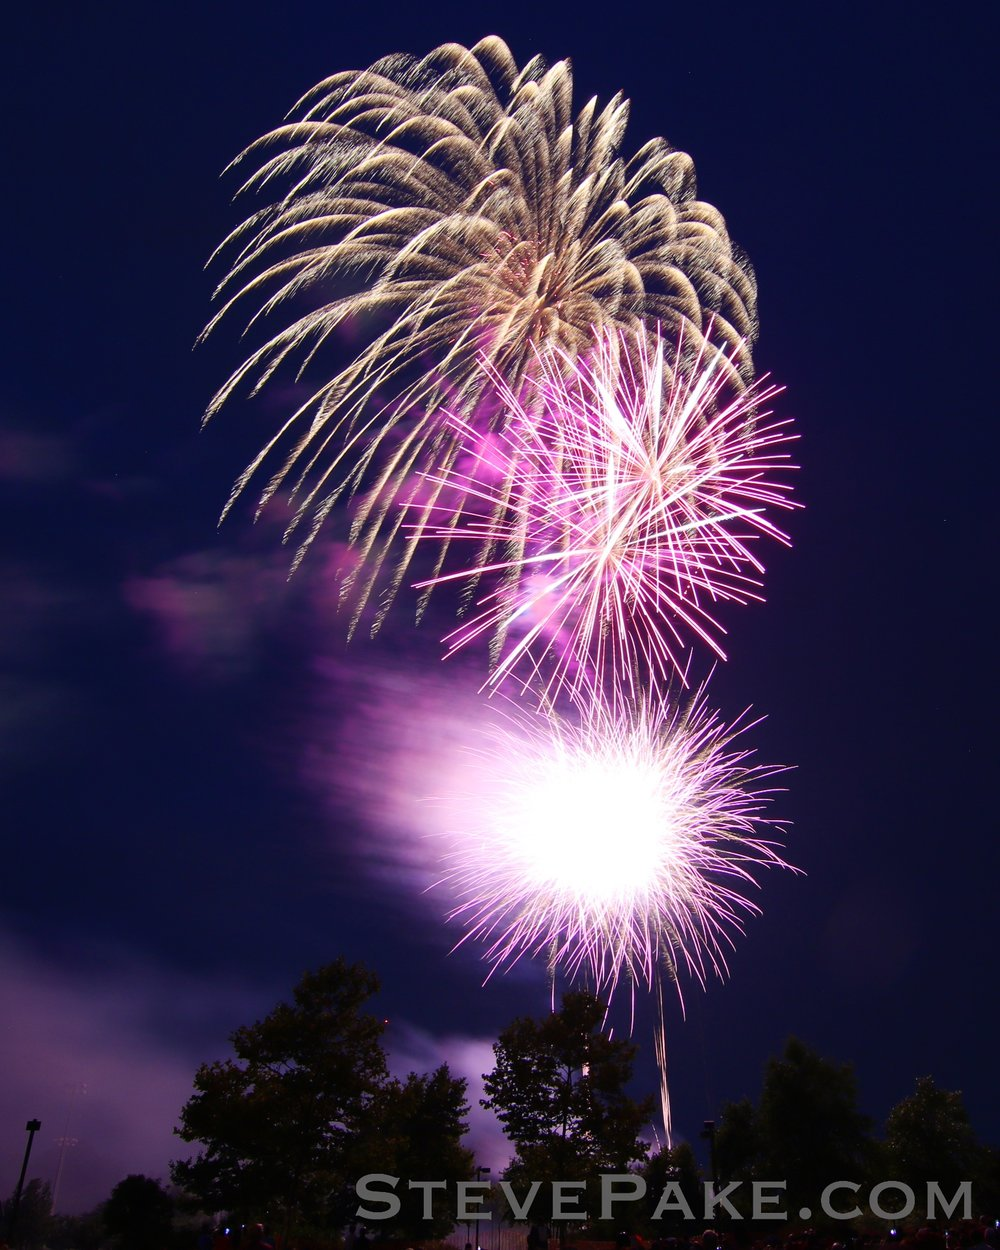 Fireworks2018_28_GE3A8551ap-HD-WM.jpg